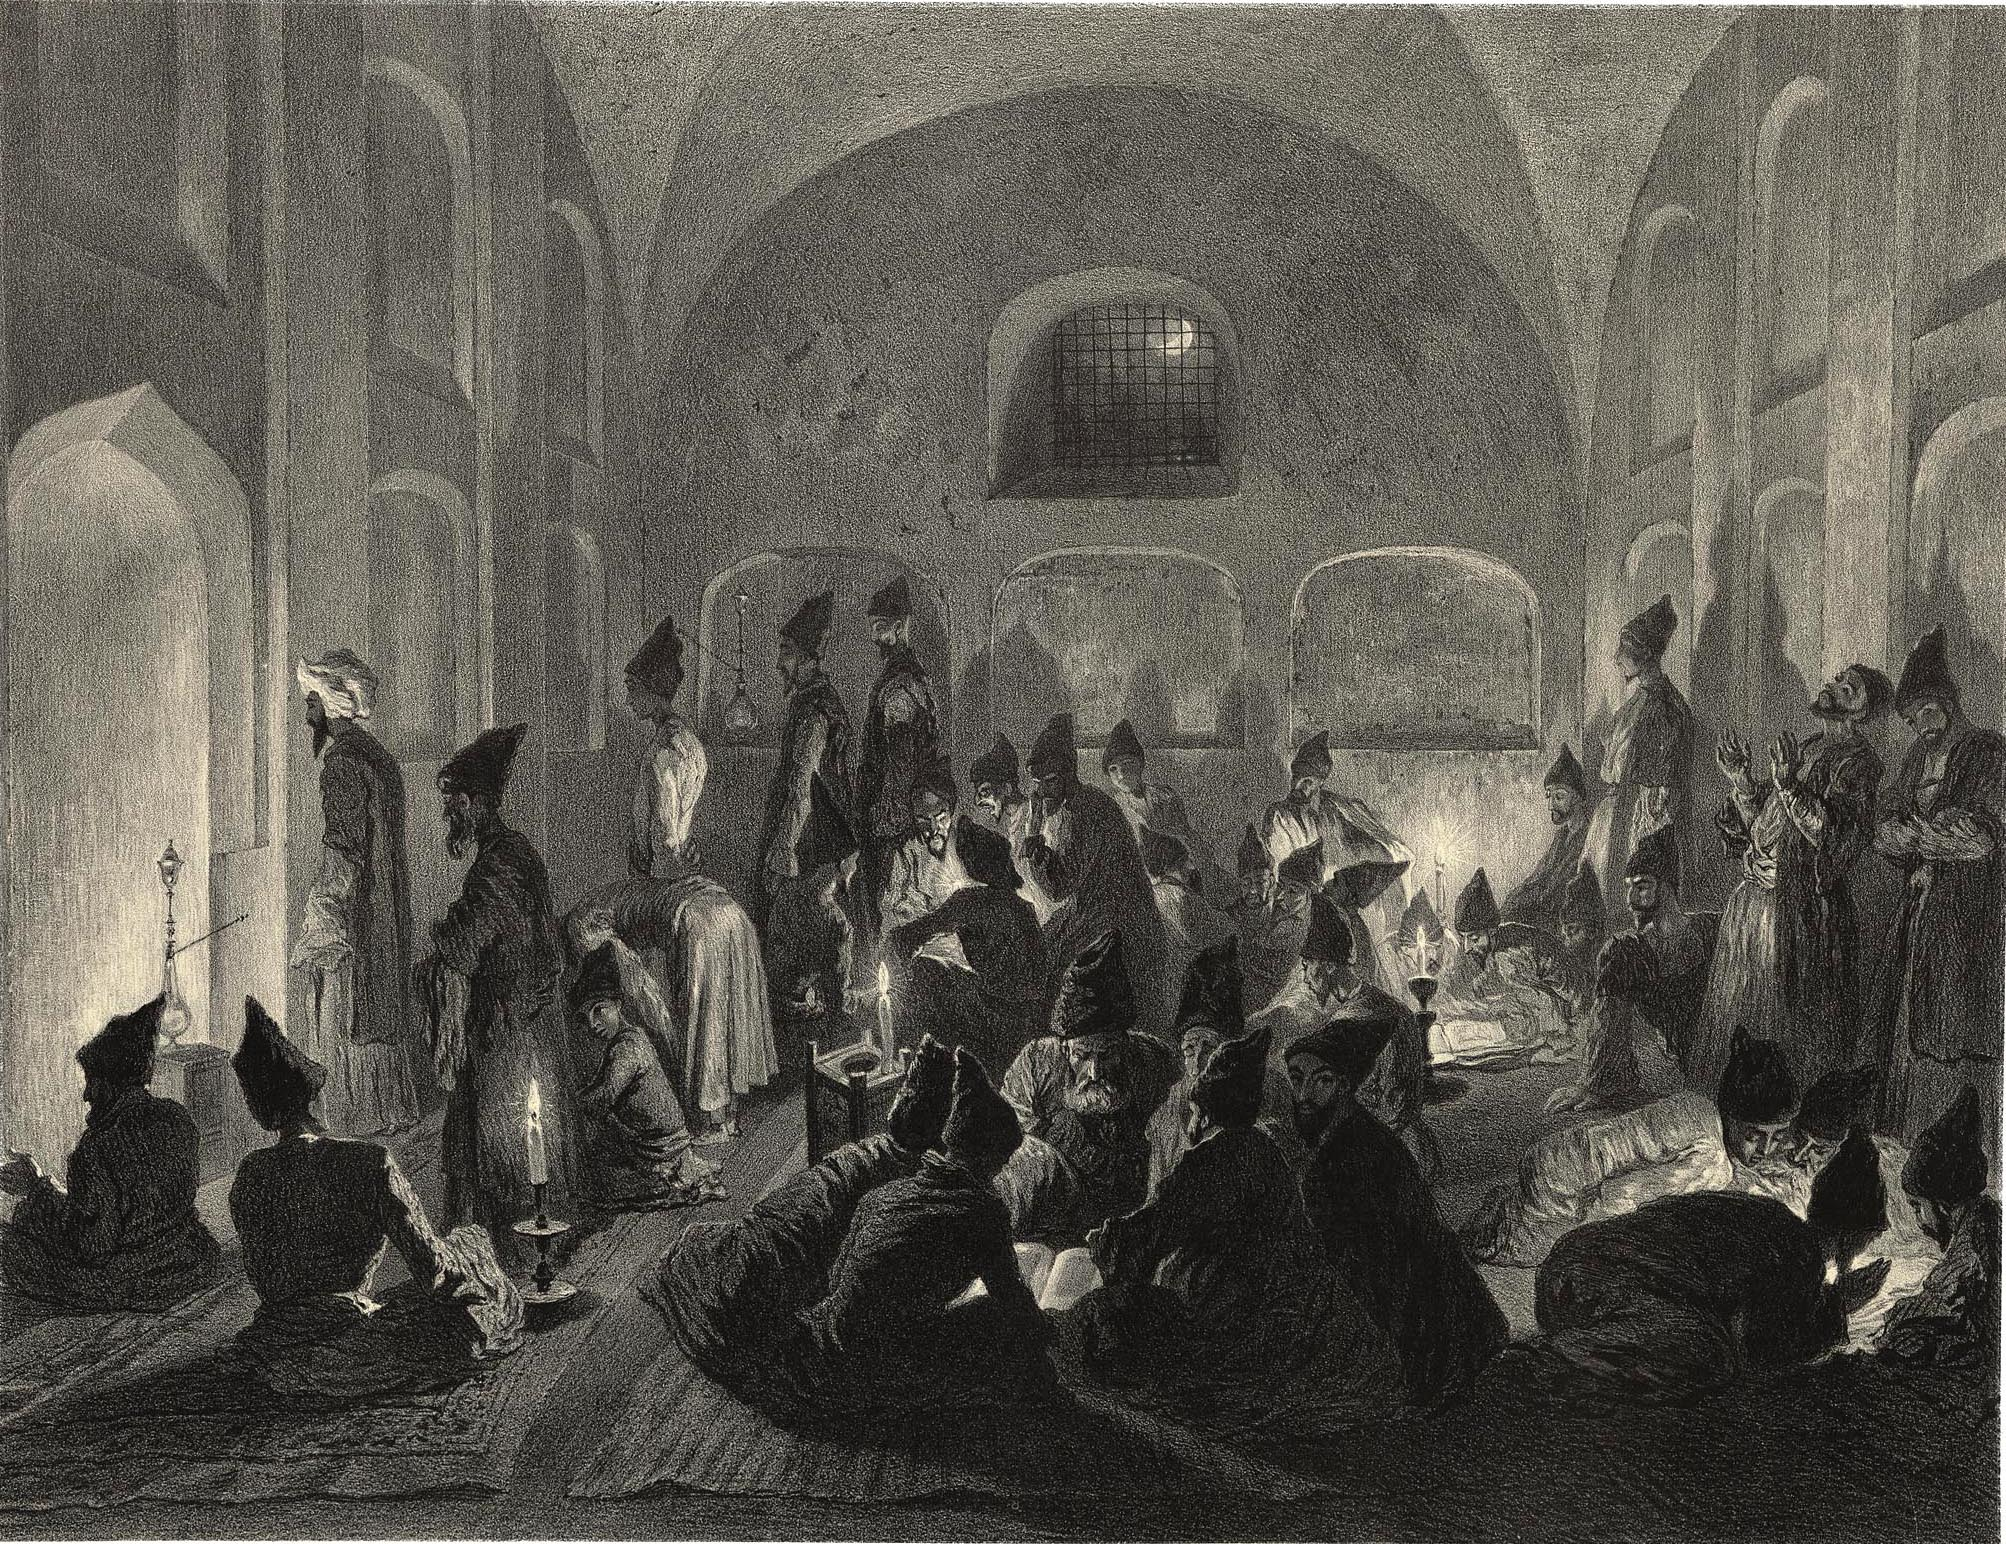 19. Armenie. Mosquee persane a Erivan / Армения. В персидской мечети в Эривани. Вечер во время Рамазана